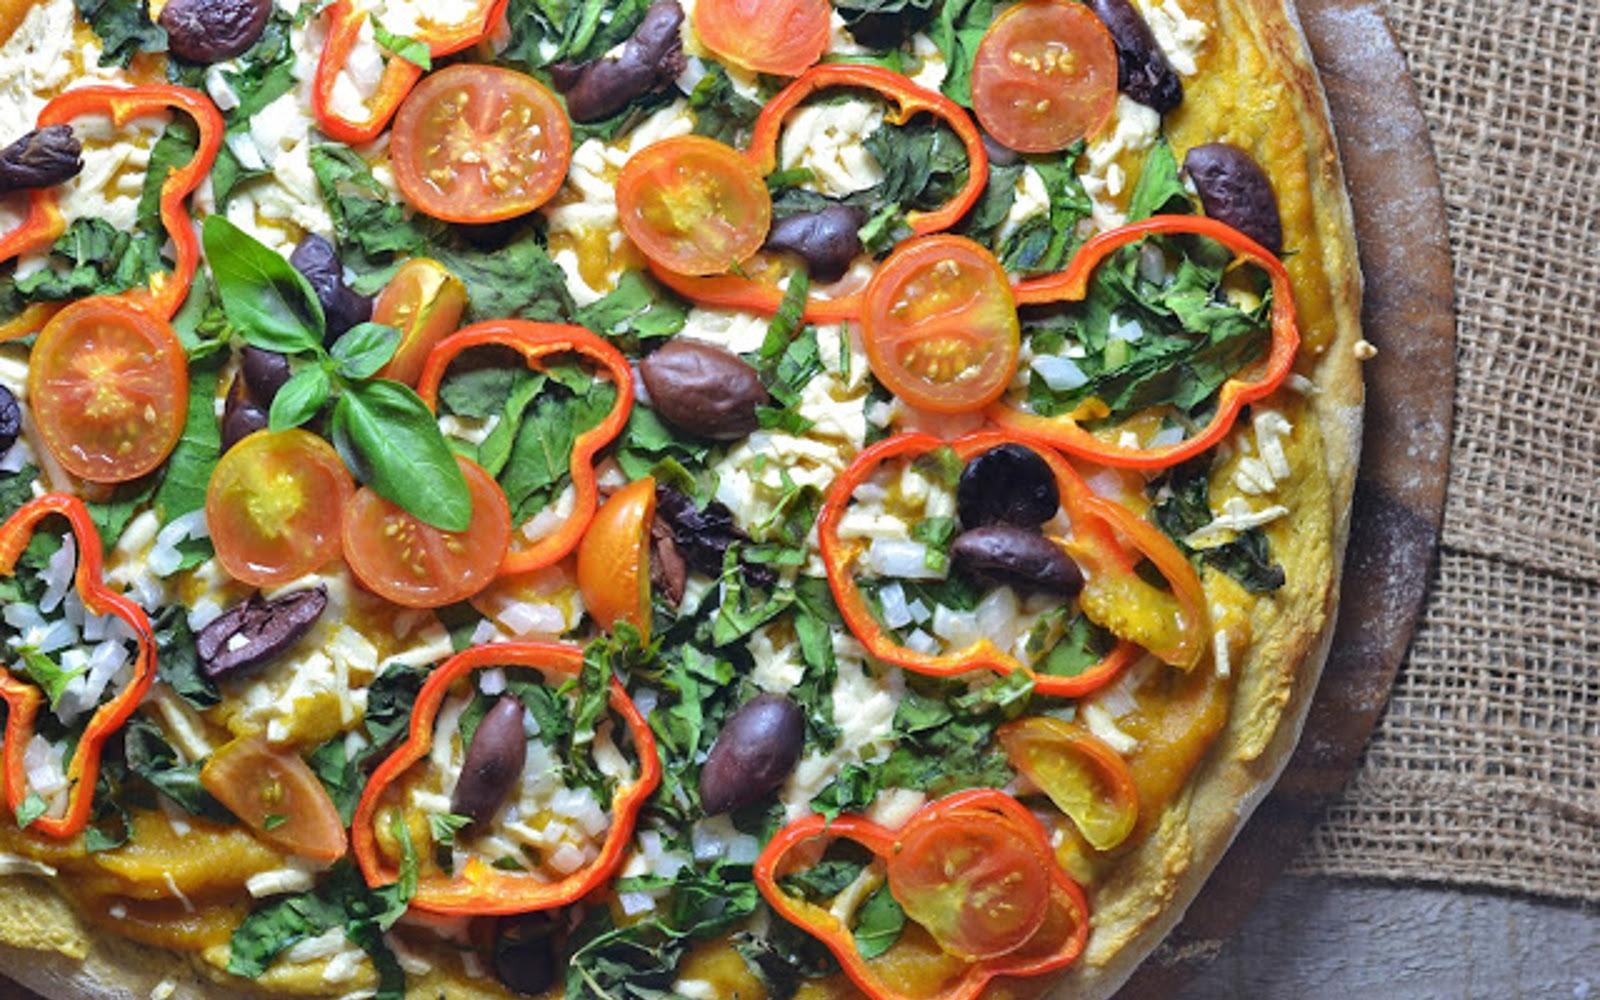 Vegan Roasted Butternut Squash Pizza With Garlic Cashew Cheese and Veggies